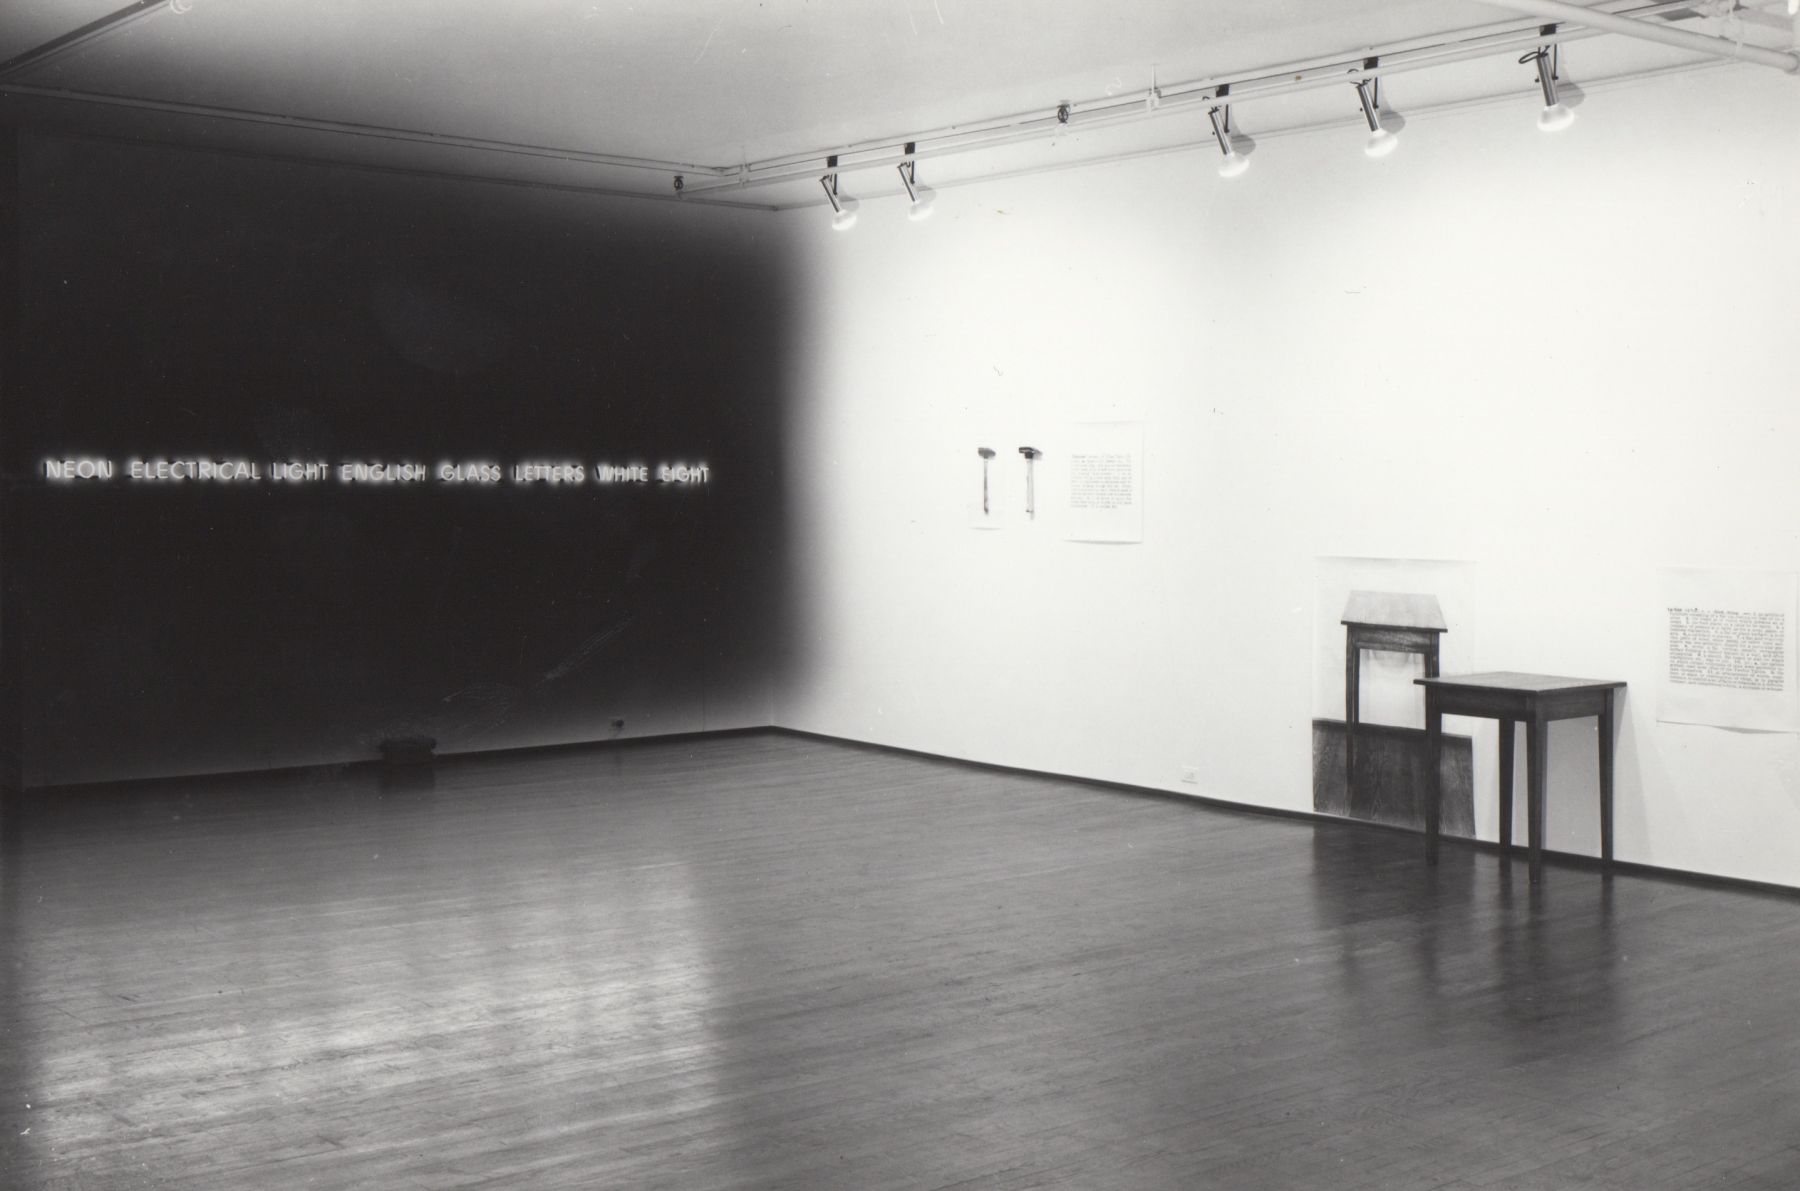 Installation view, Joseph Kosuth: Protoinvestigations 1965 – 1967, 420 WEST BROADWAY